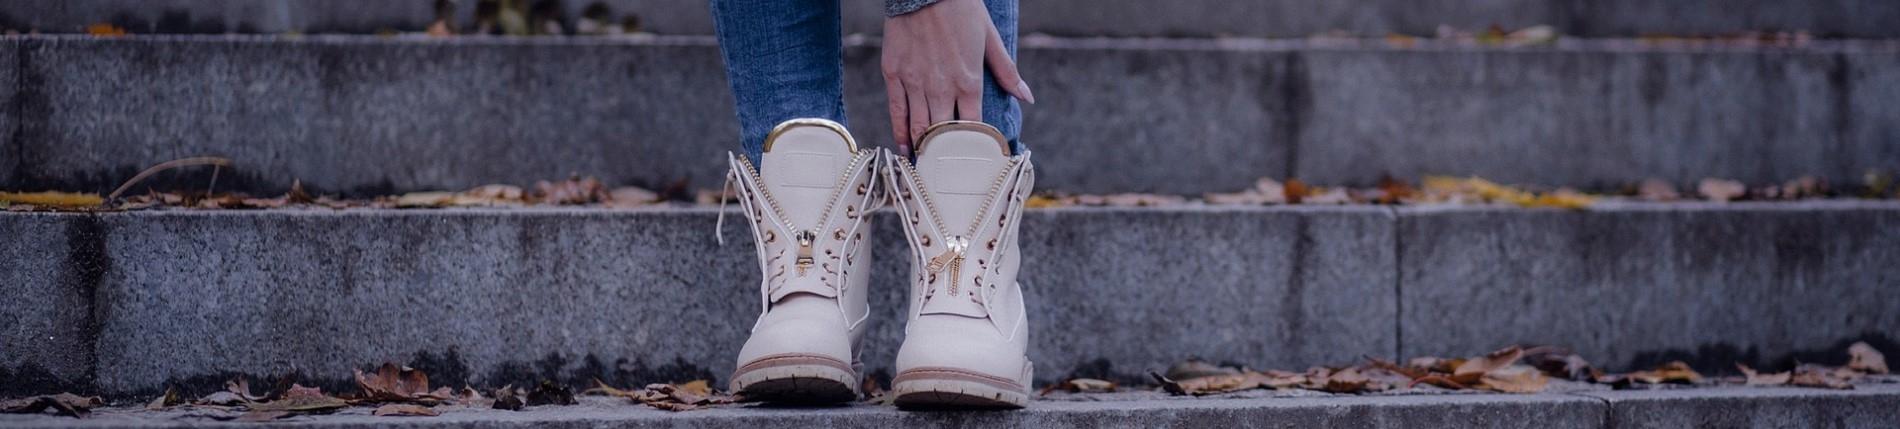 Muut kengät